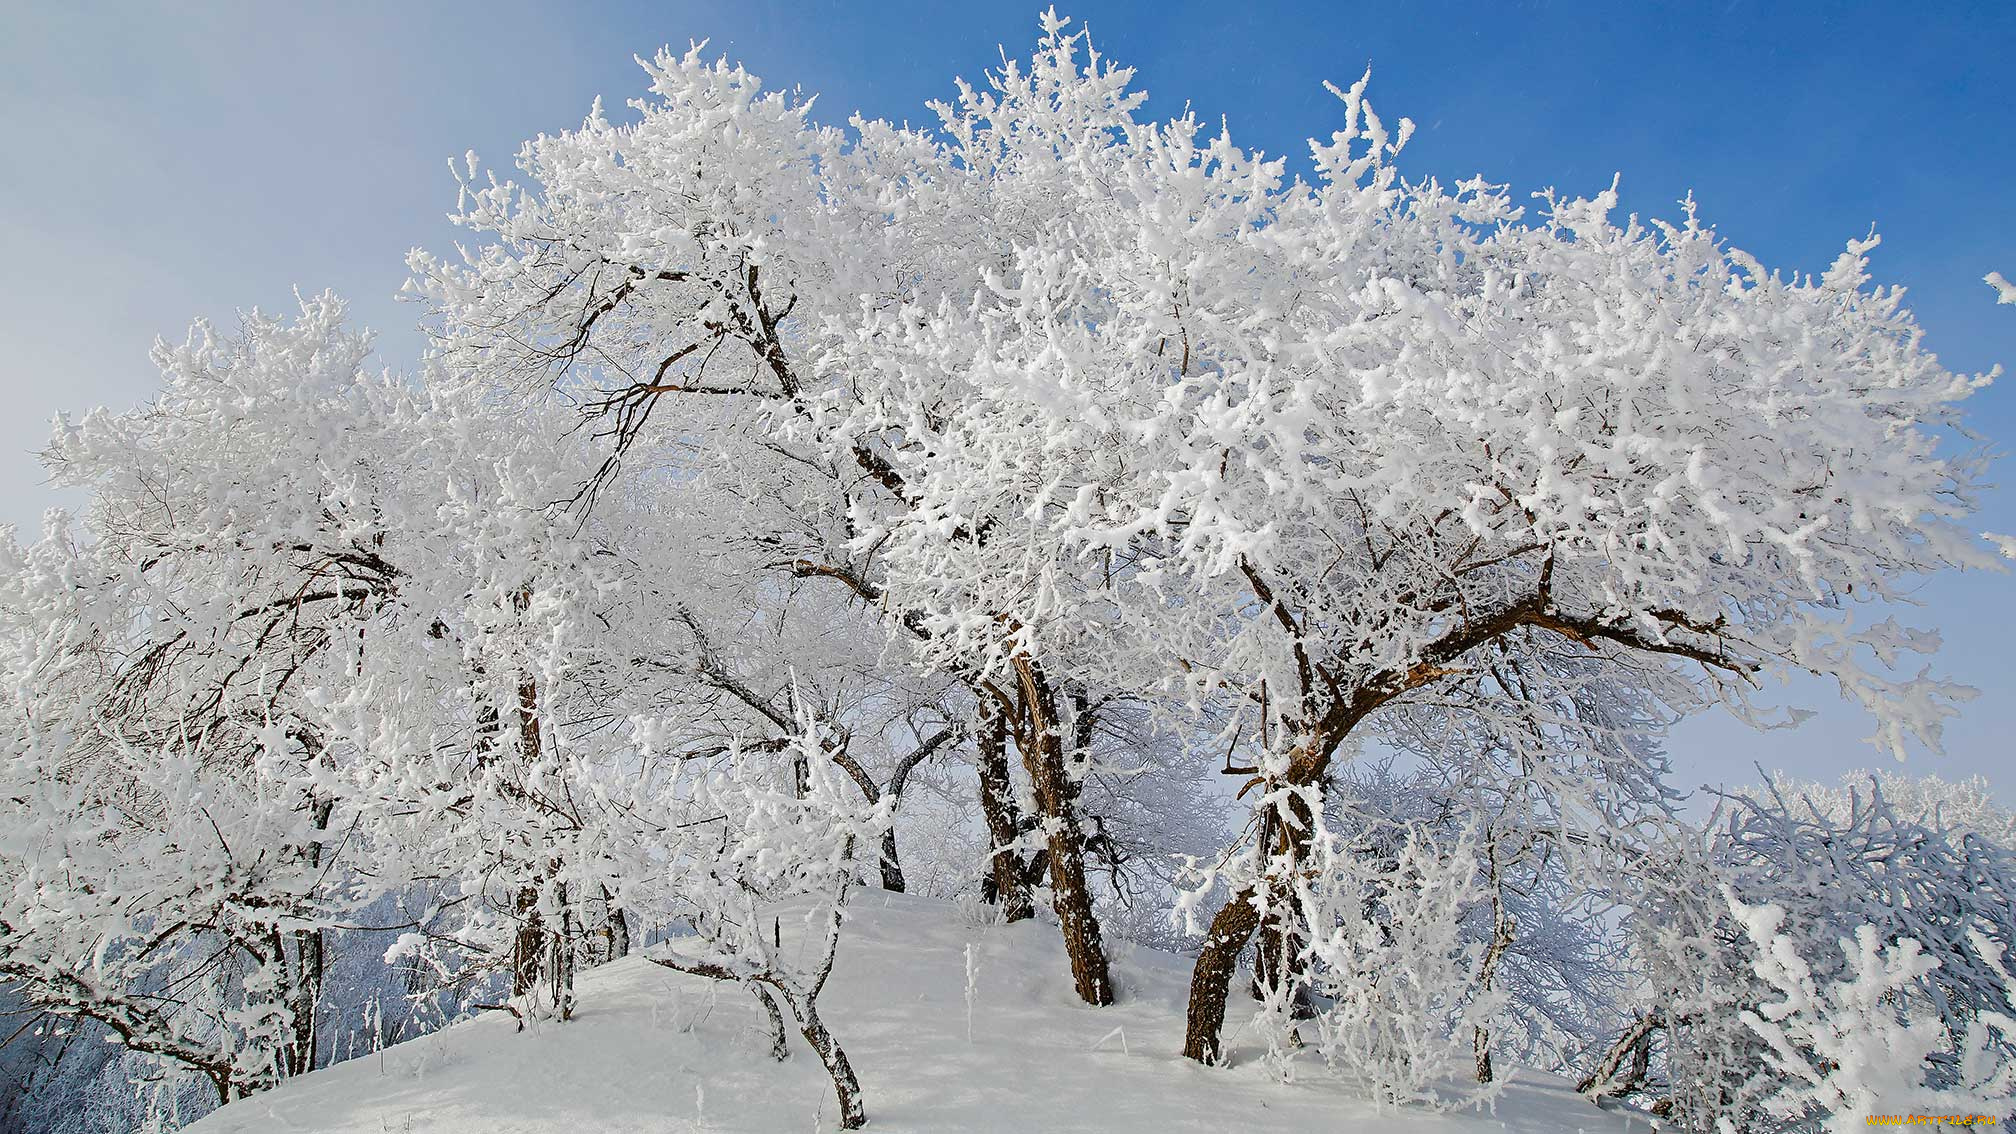 Иней дерево зима бесплатно